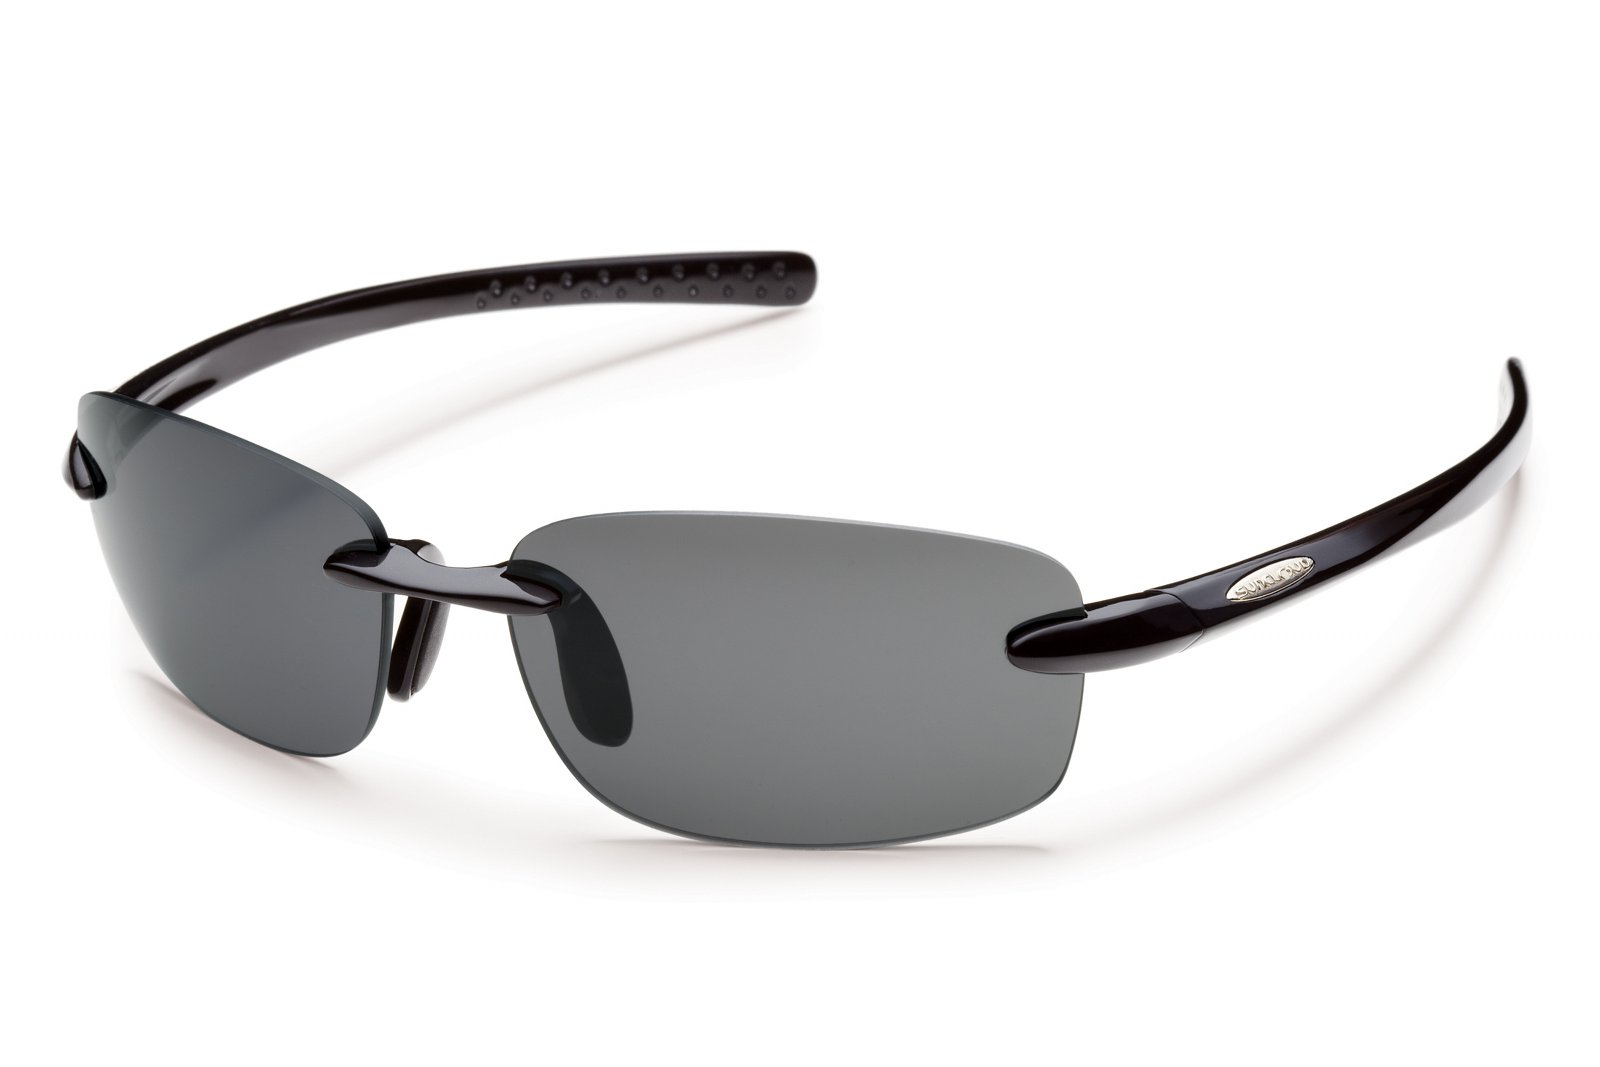 d53ca18d1ed Suncloud Polarized Optics Aviator Sunglasses